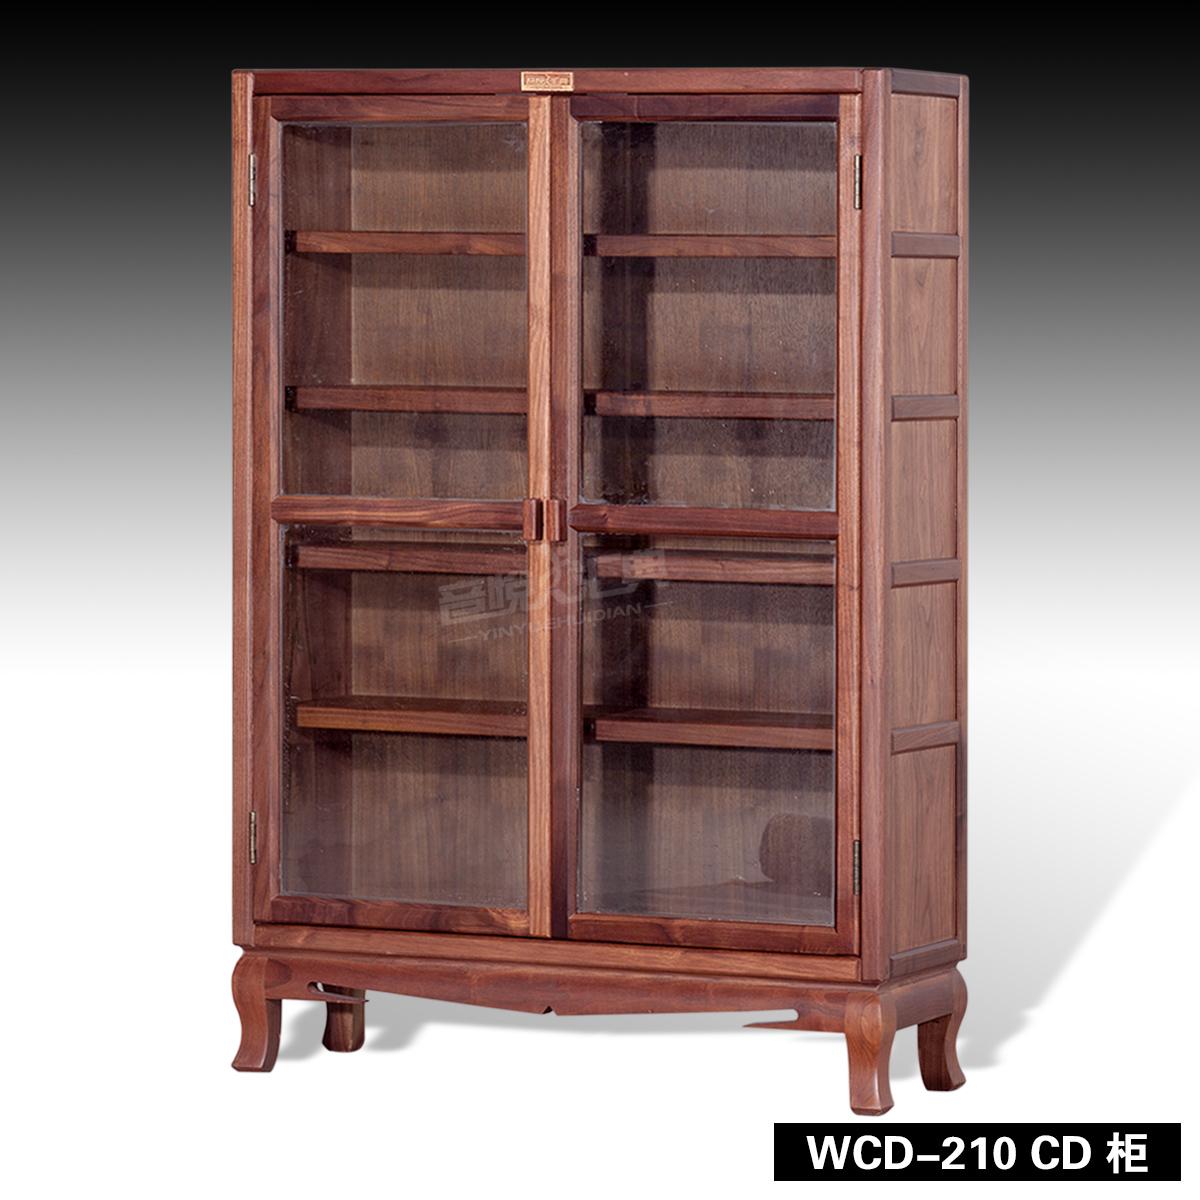 Yin Yue Department Code Wcd 210 Glass Doors Wood Cd Cabinet